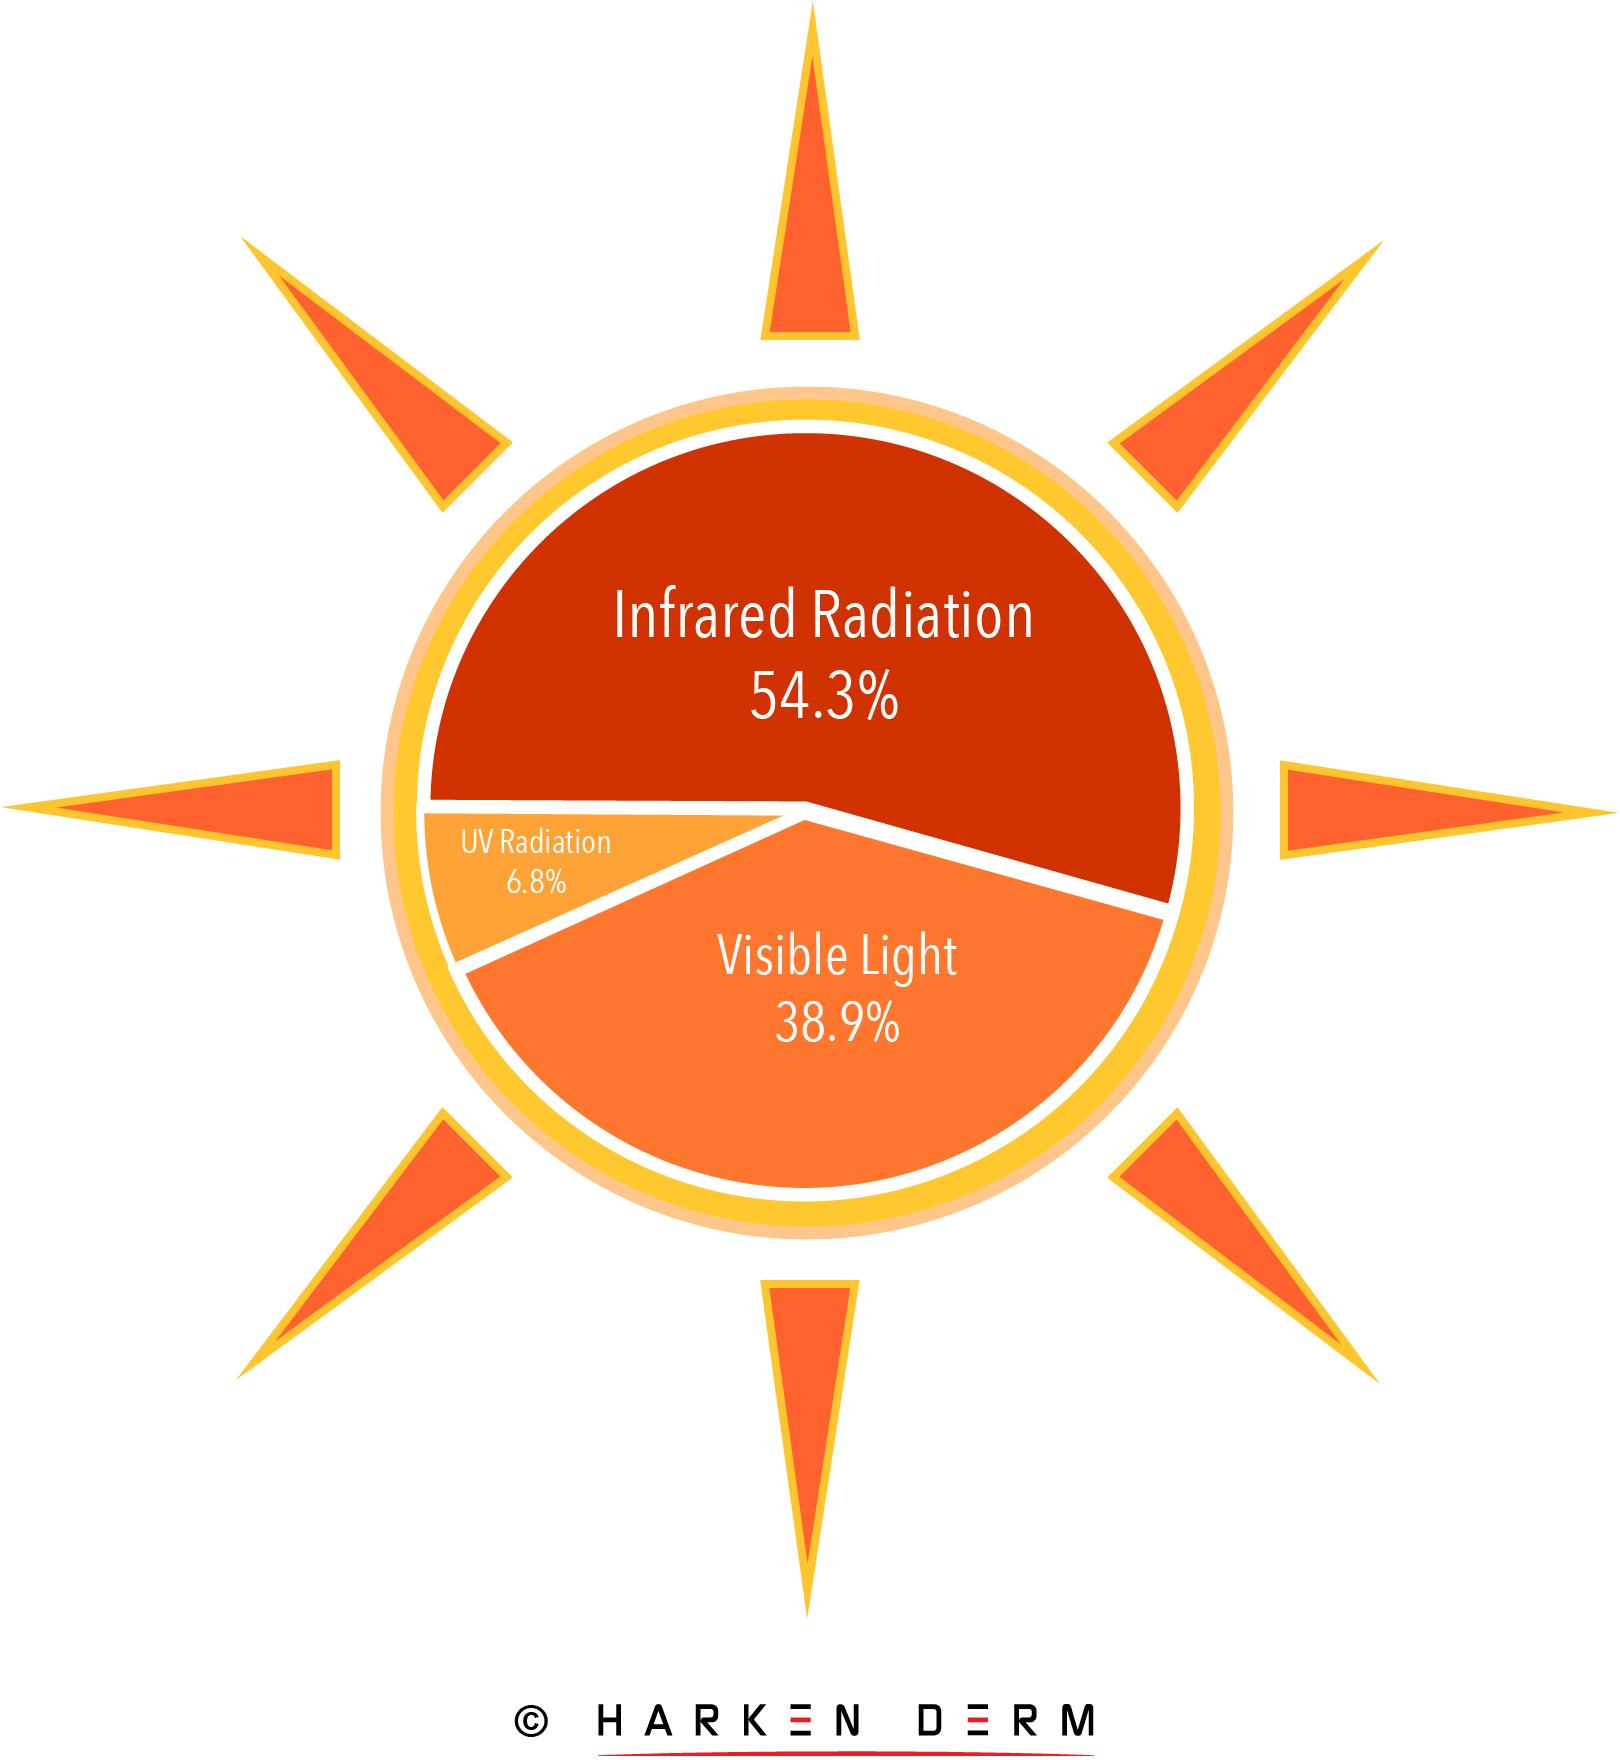 Solar Radiation Harken Derm@2x-100.jpg